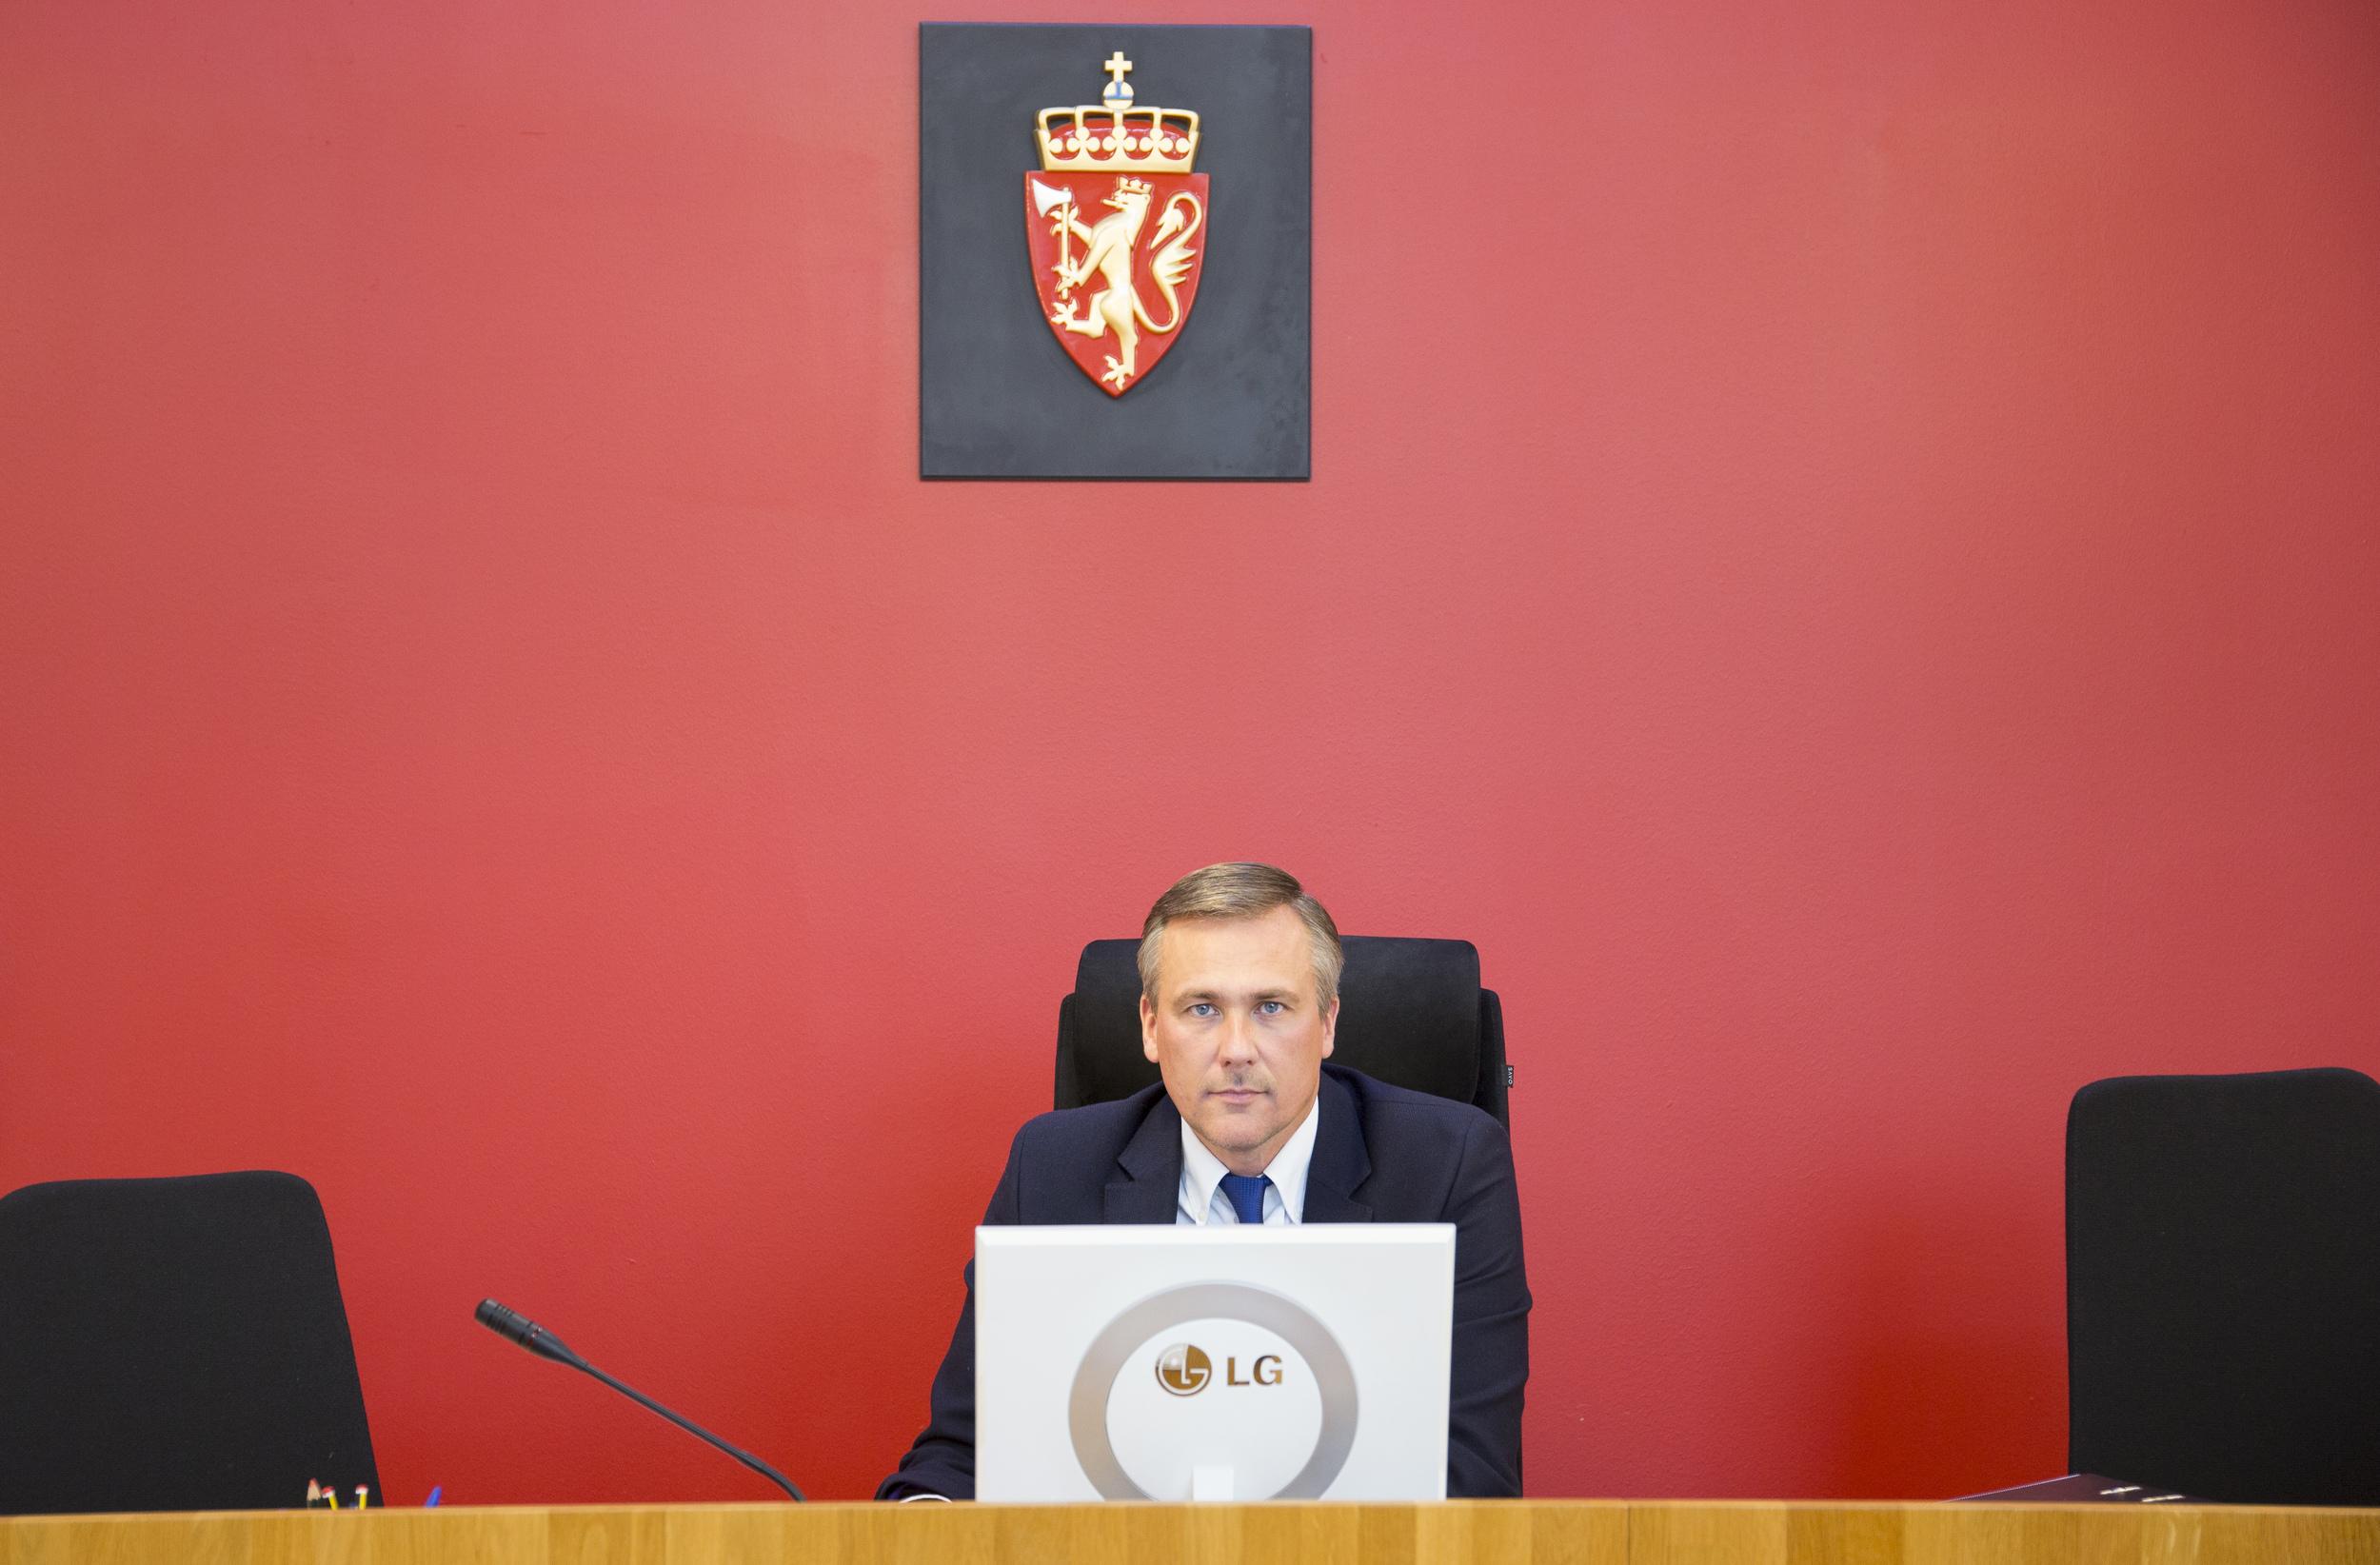 Judge Rune Nordby